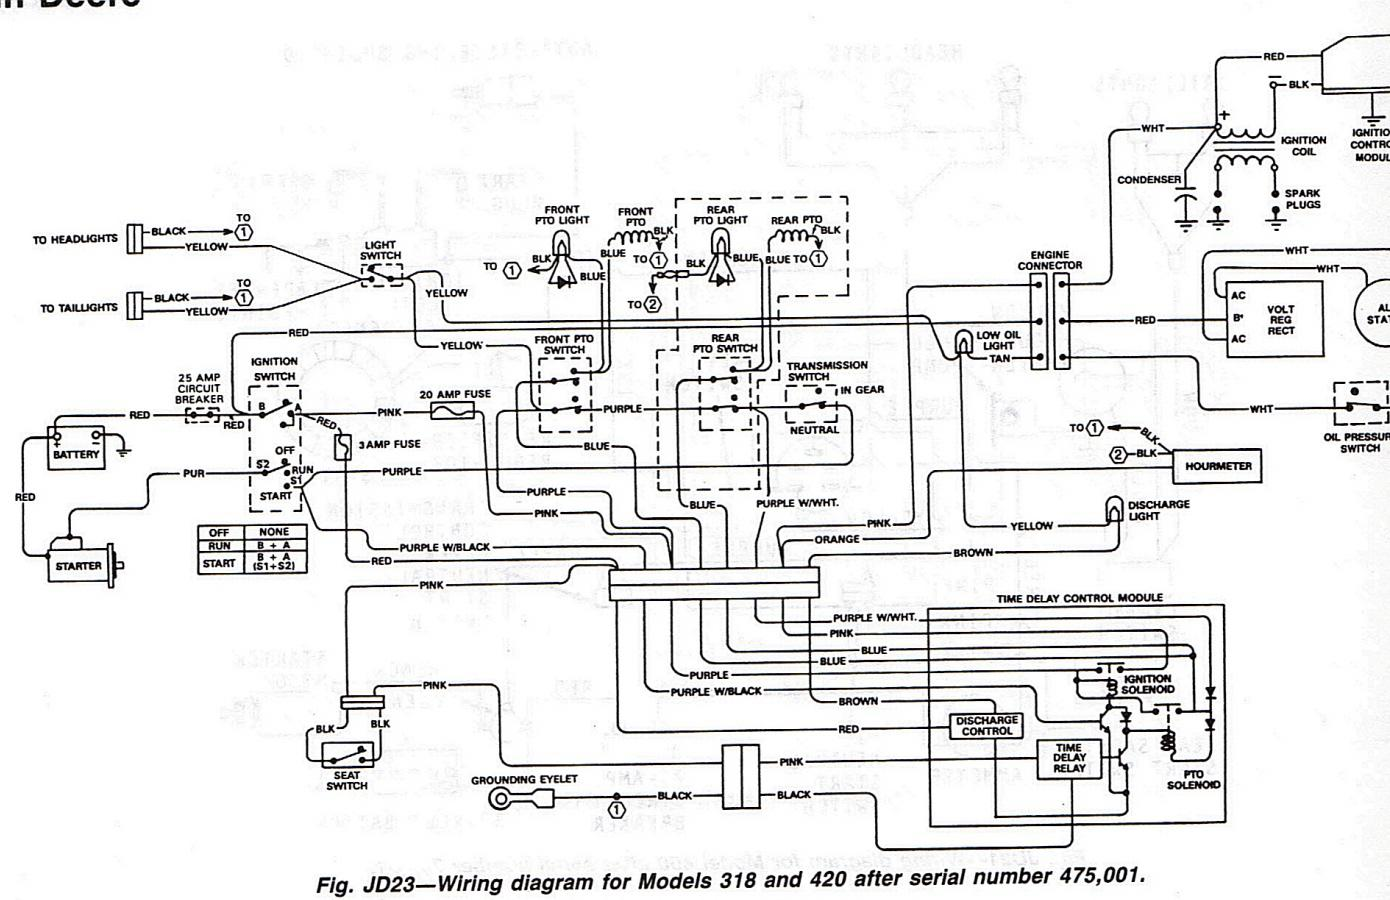 Deere After on Dodge Ignition Wiring Schematic